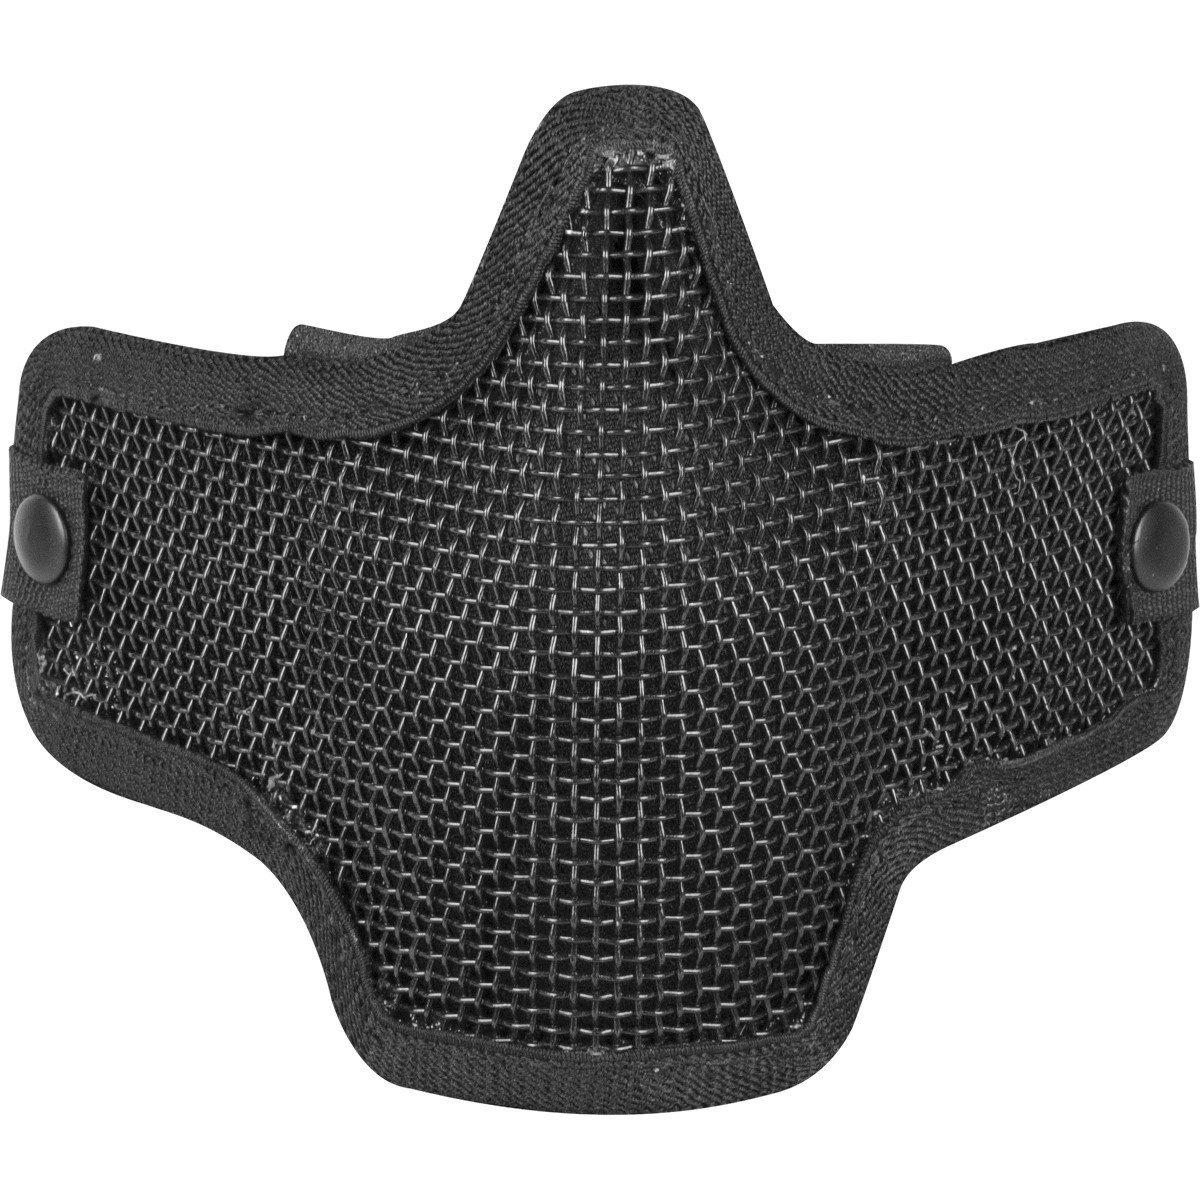 Valken Kilo 2G Mesh Mask Black